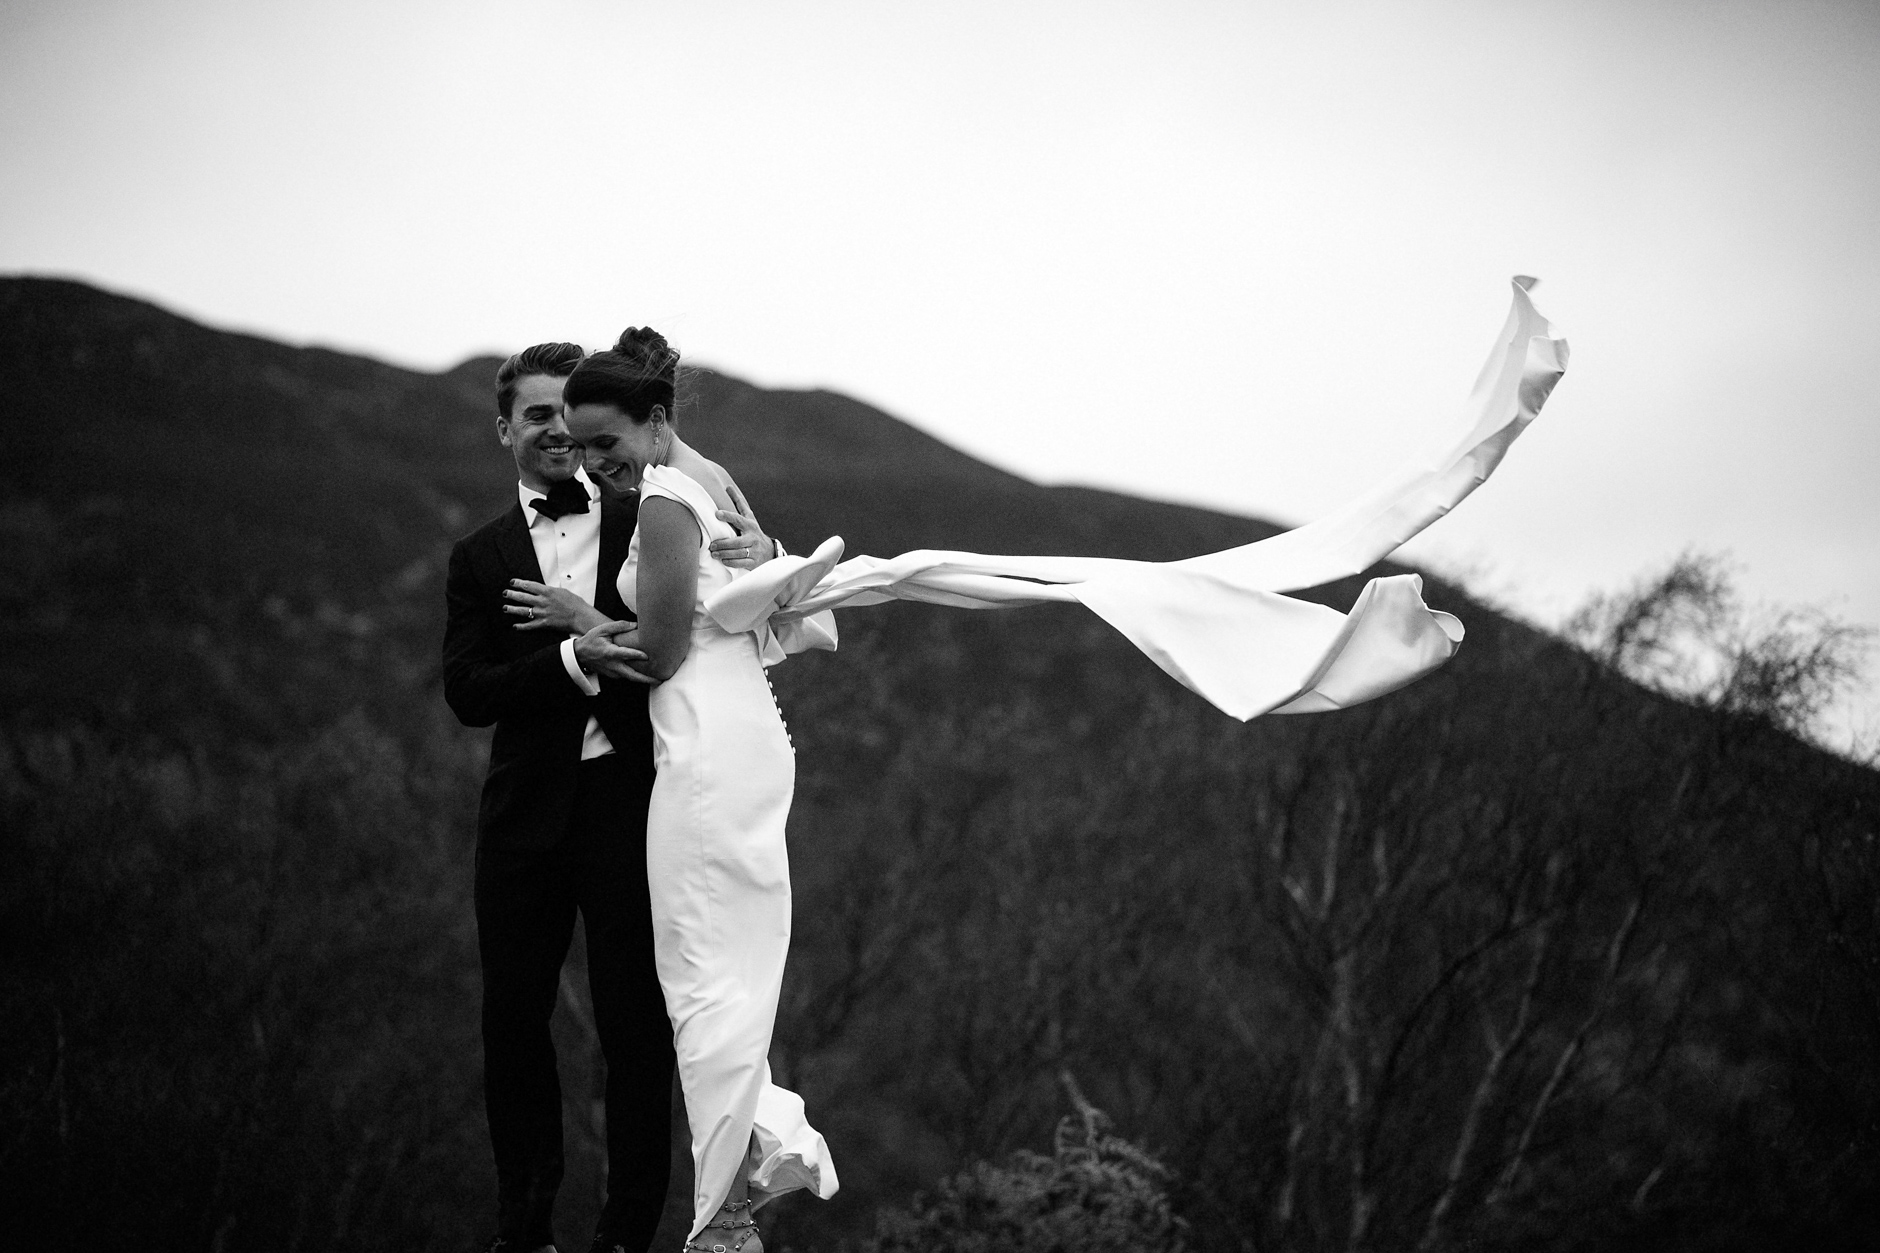 Glentruim-Wedding-Nikki-Leadbetter-Photography-158.jpg